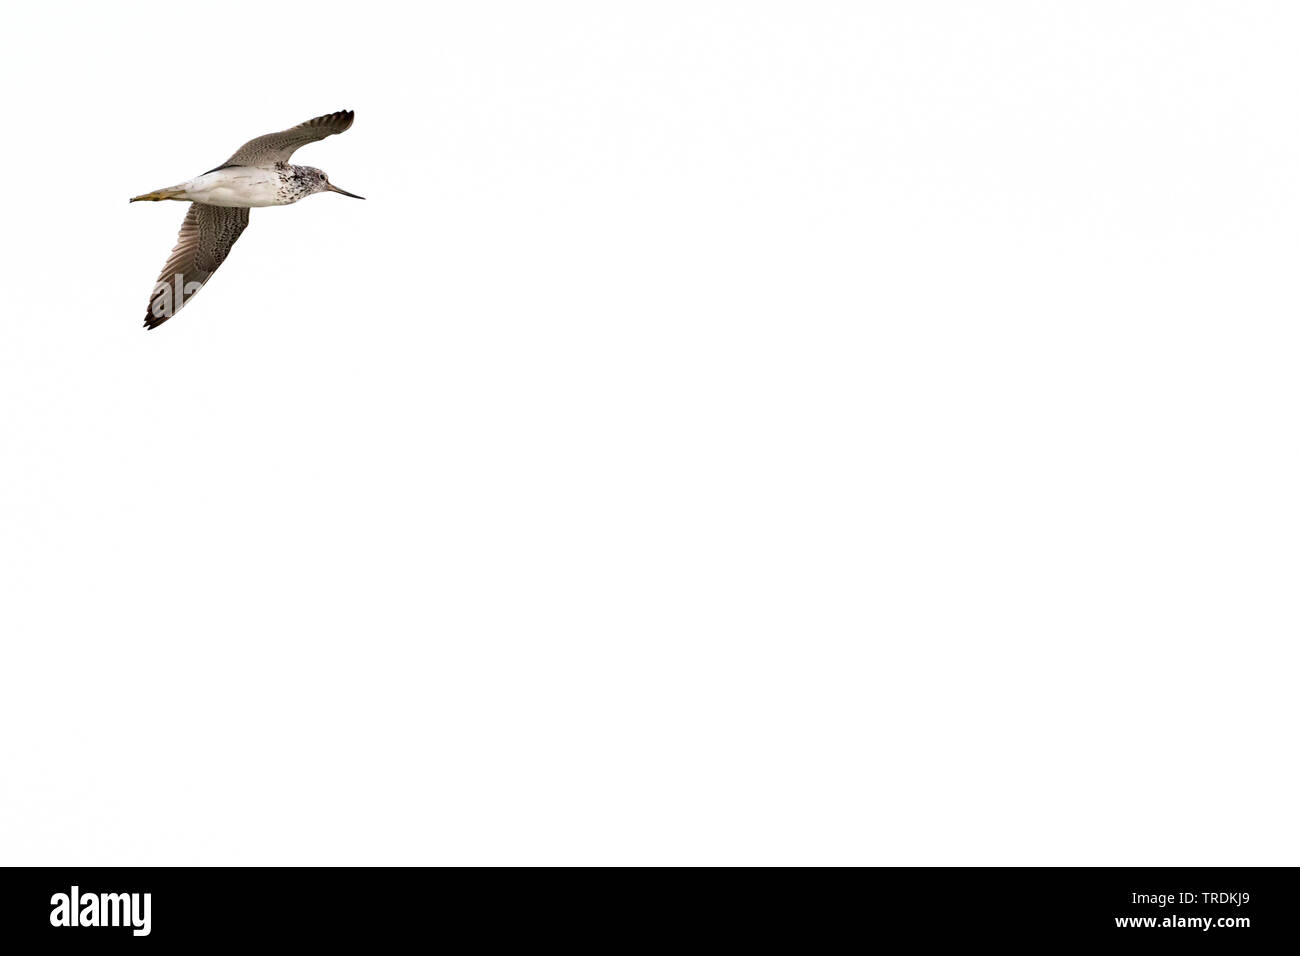 Gruenschenkel (Tringa nebularia), im Flug, Deutschland | common greenshank (Tringa nebularia), flying, Germany | BLWS505736.jpg [ (c) blickwinkel/AGAM - Stock Image